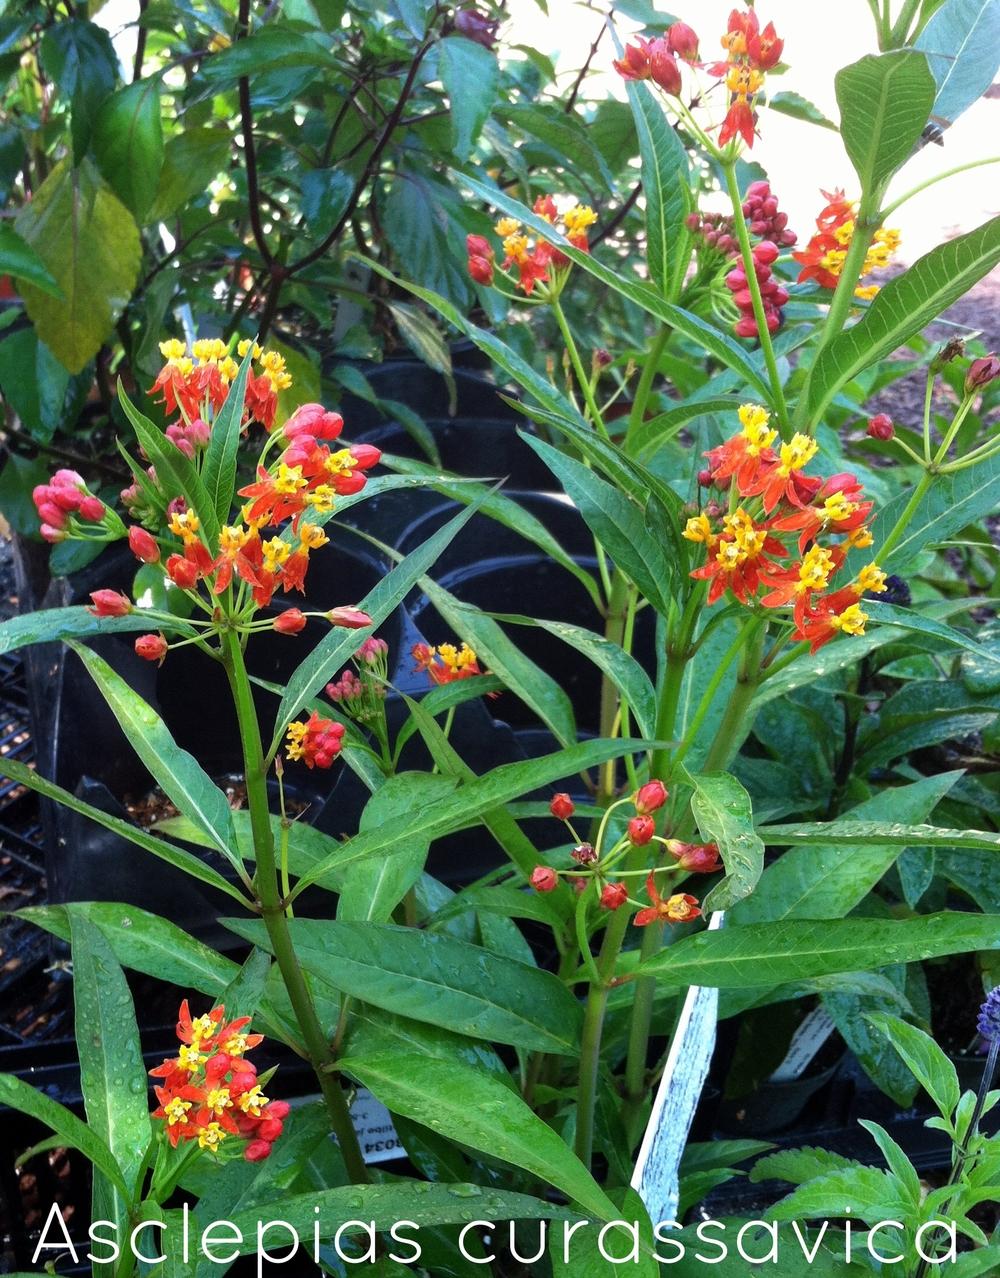 Asclepias curassavica at Marie's Garden